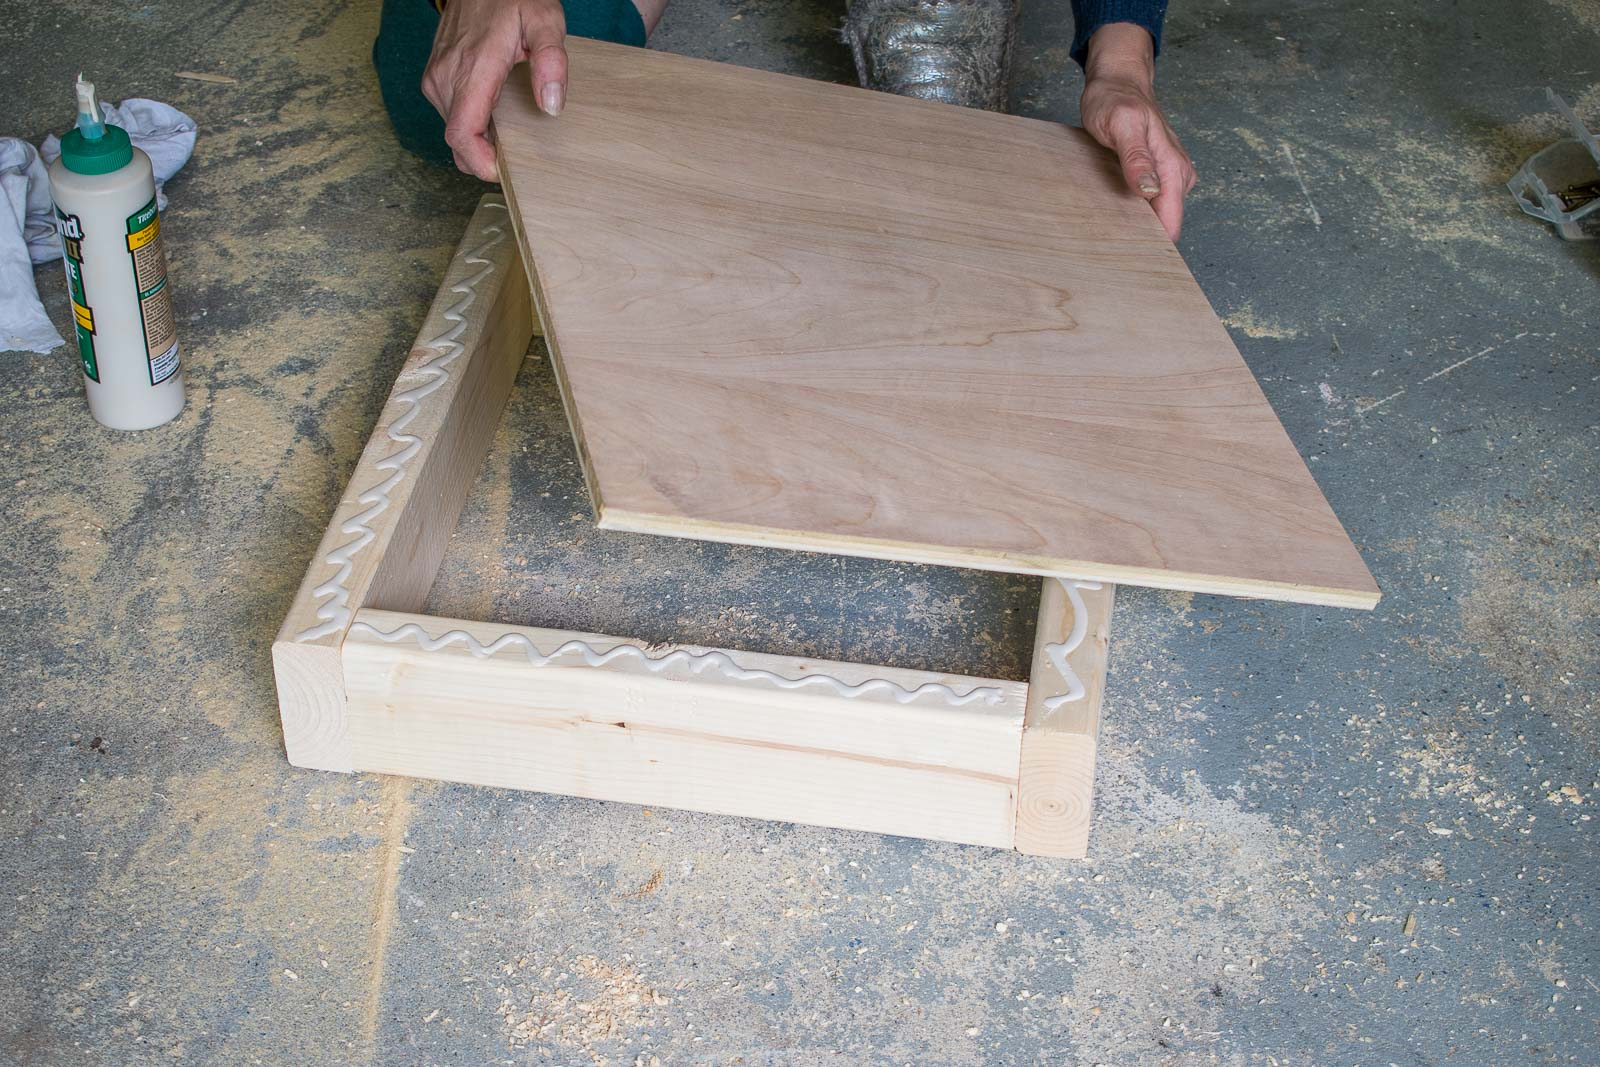 wood glue and screws